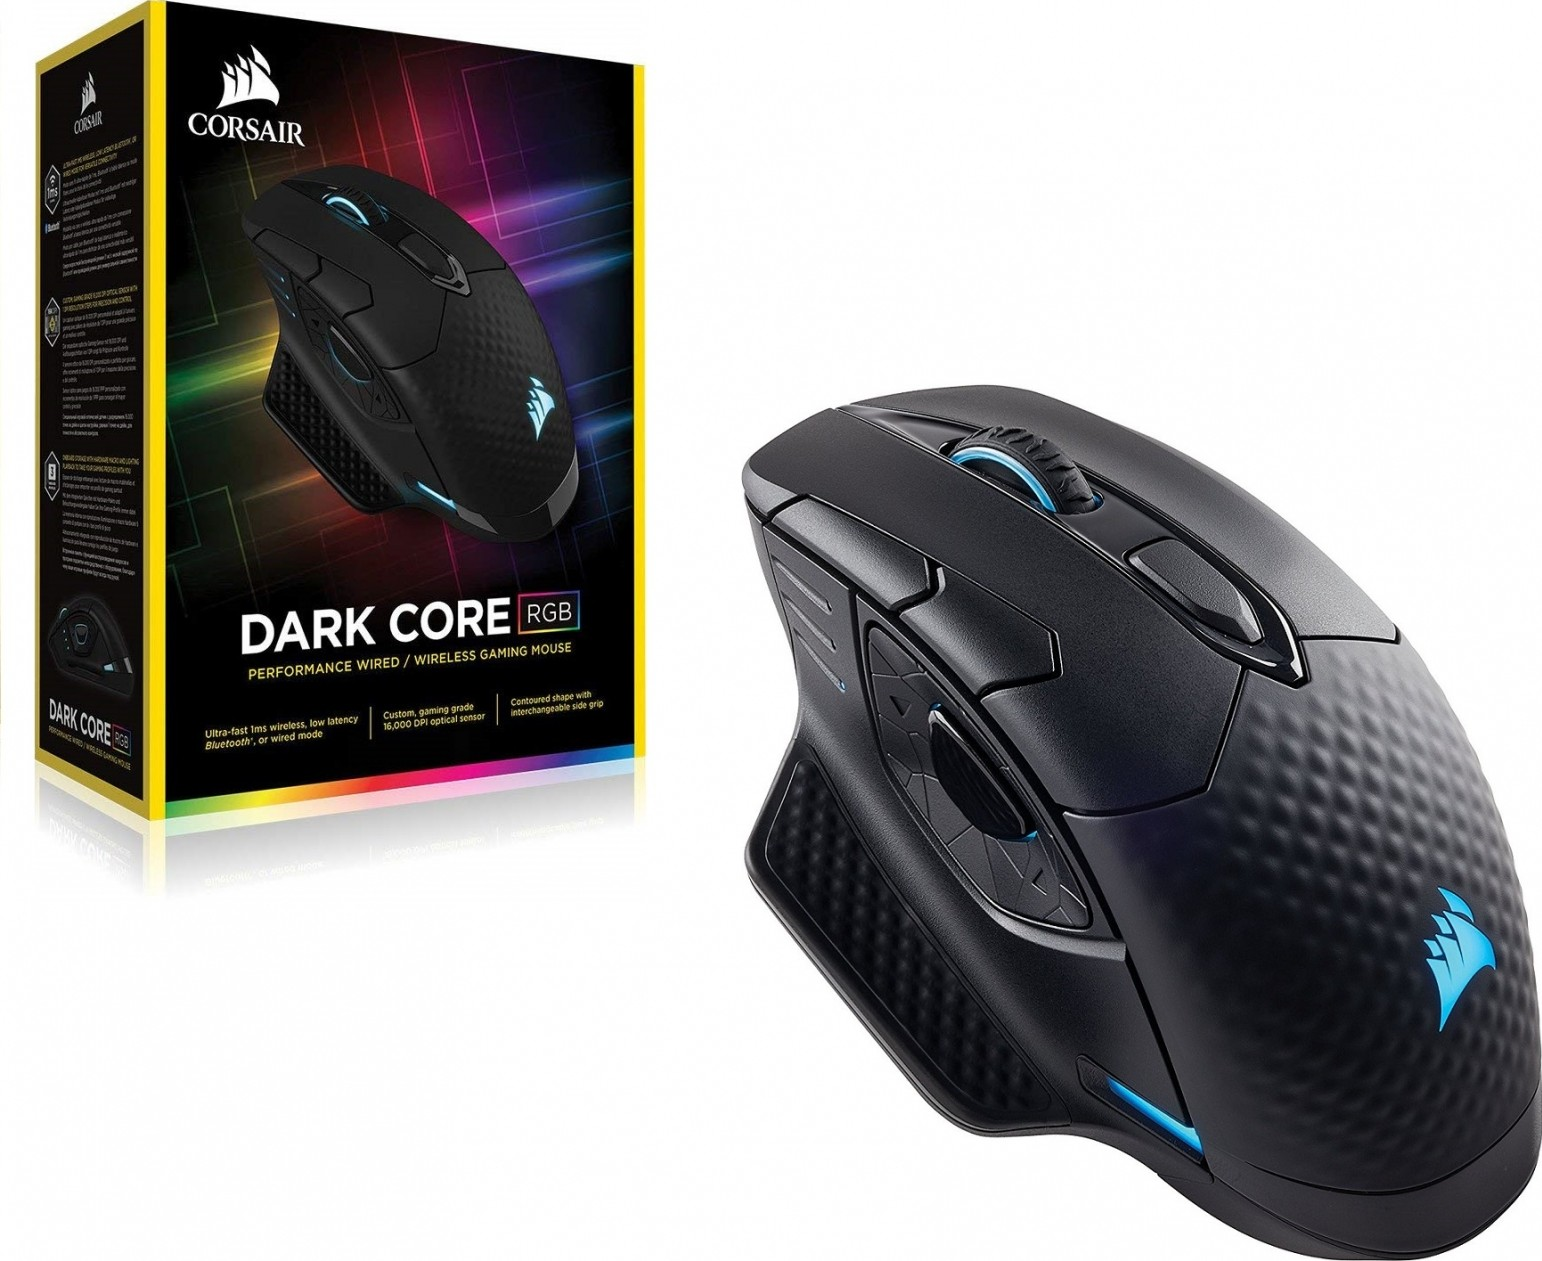 f808e9d0fca Corsair DARK CORE RGB Performance Wired / Wireless Gaming Mouse (EU) –  Black